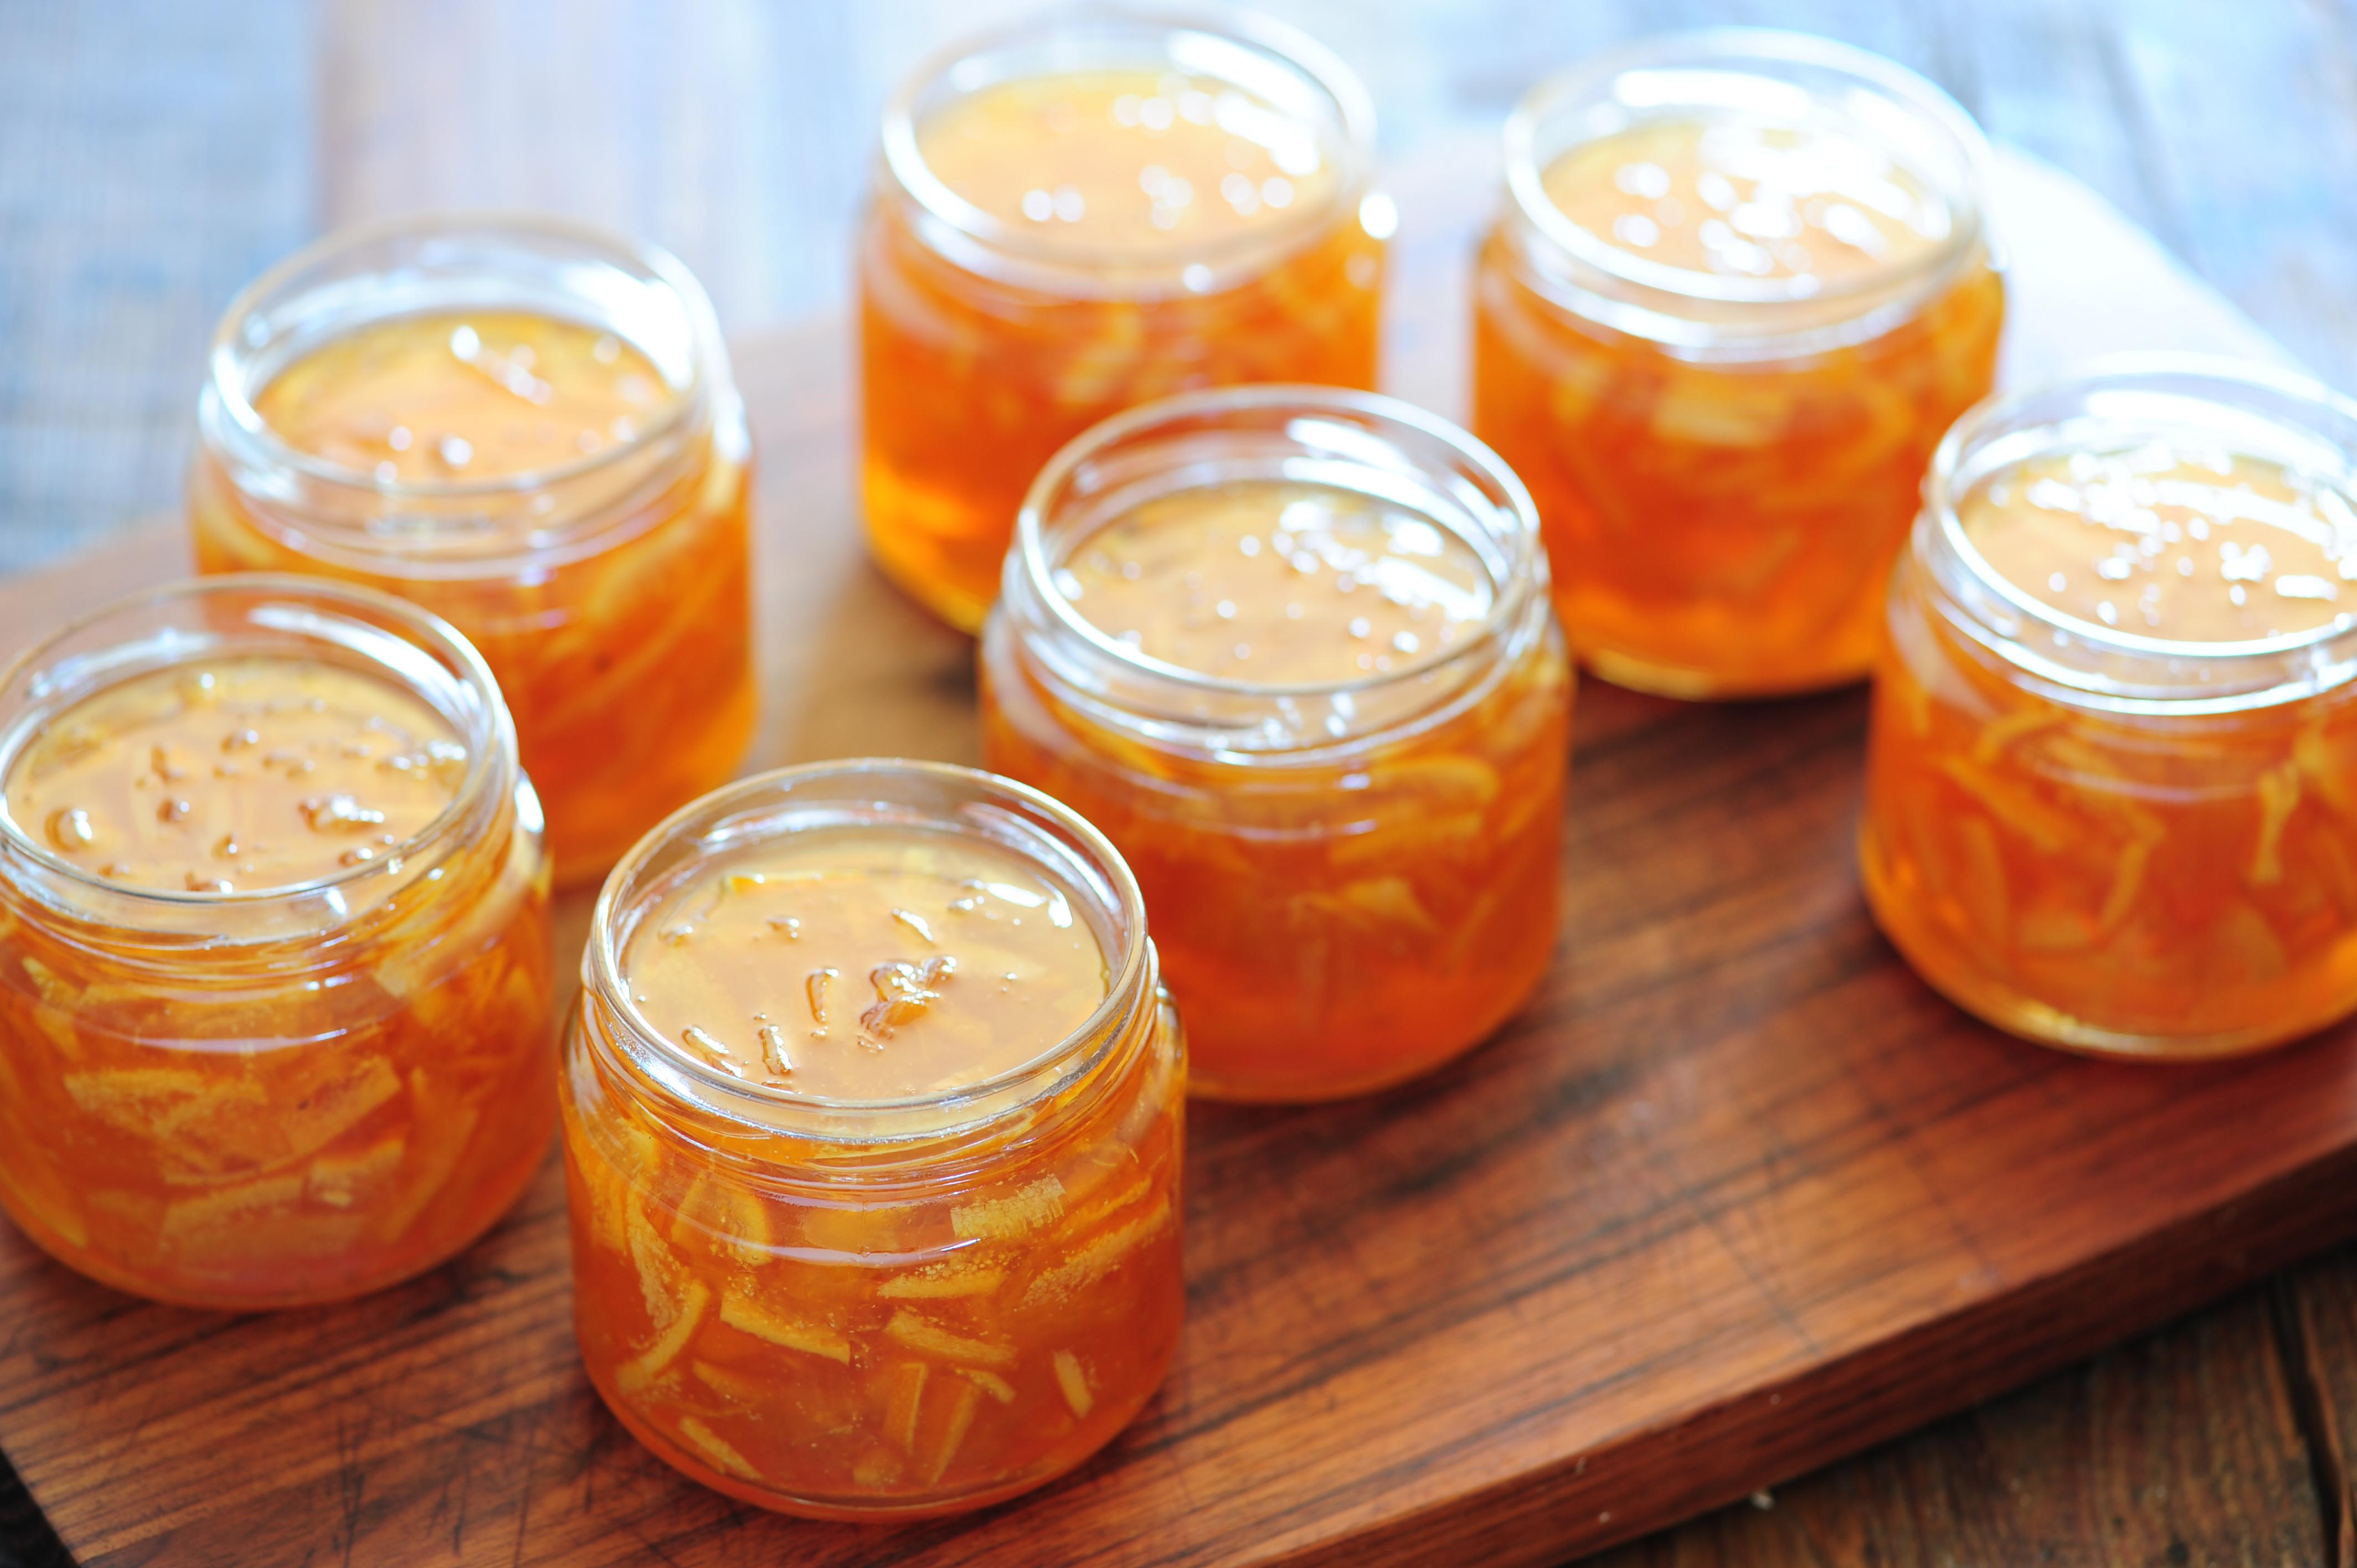 File:Orange marmalade-3.jpg - Wikimedia Commons